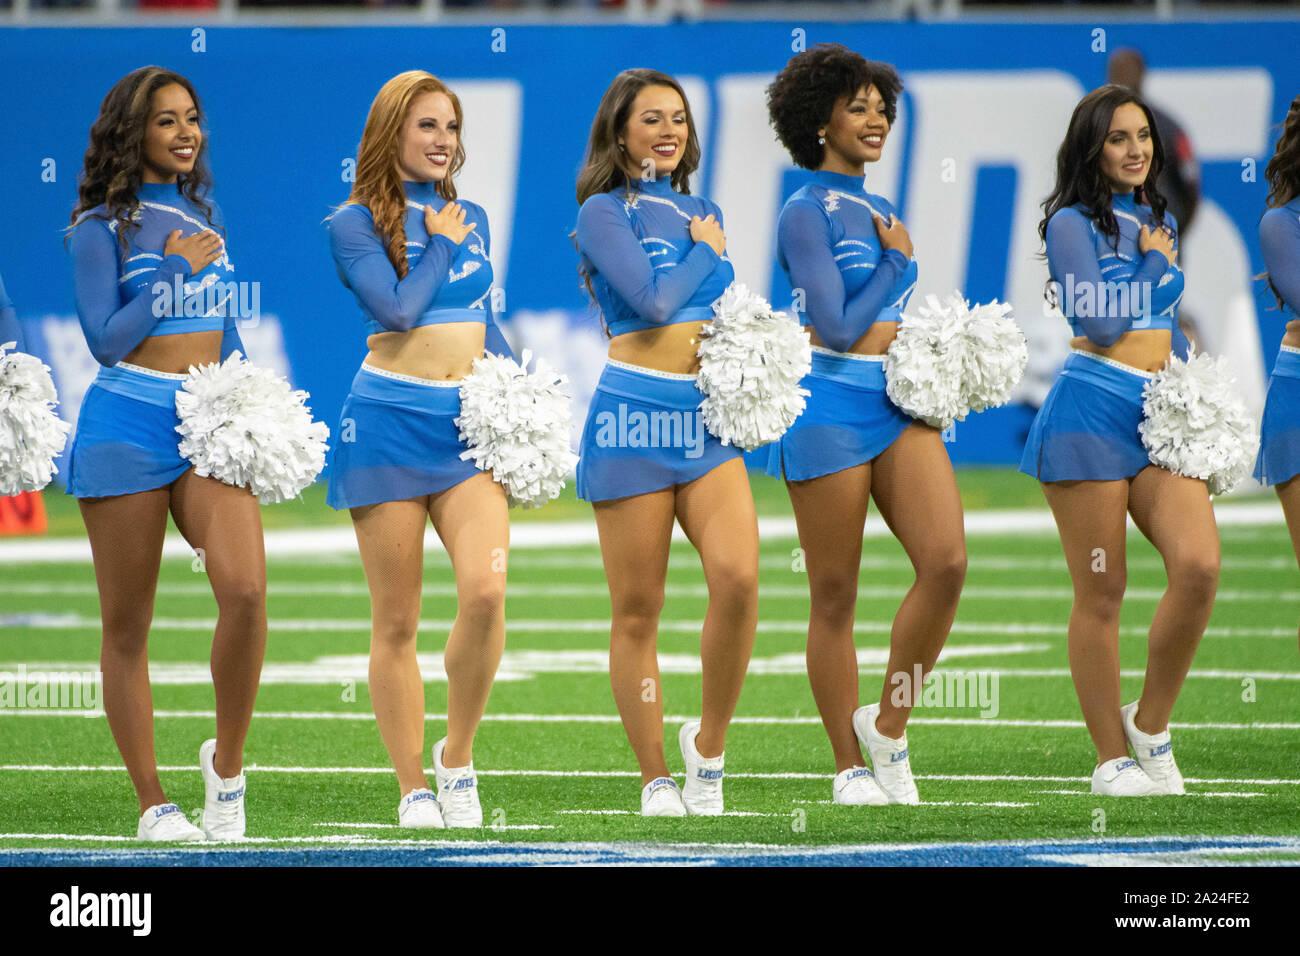 Detroit Mi September 29 Lions Cheerleaders During The